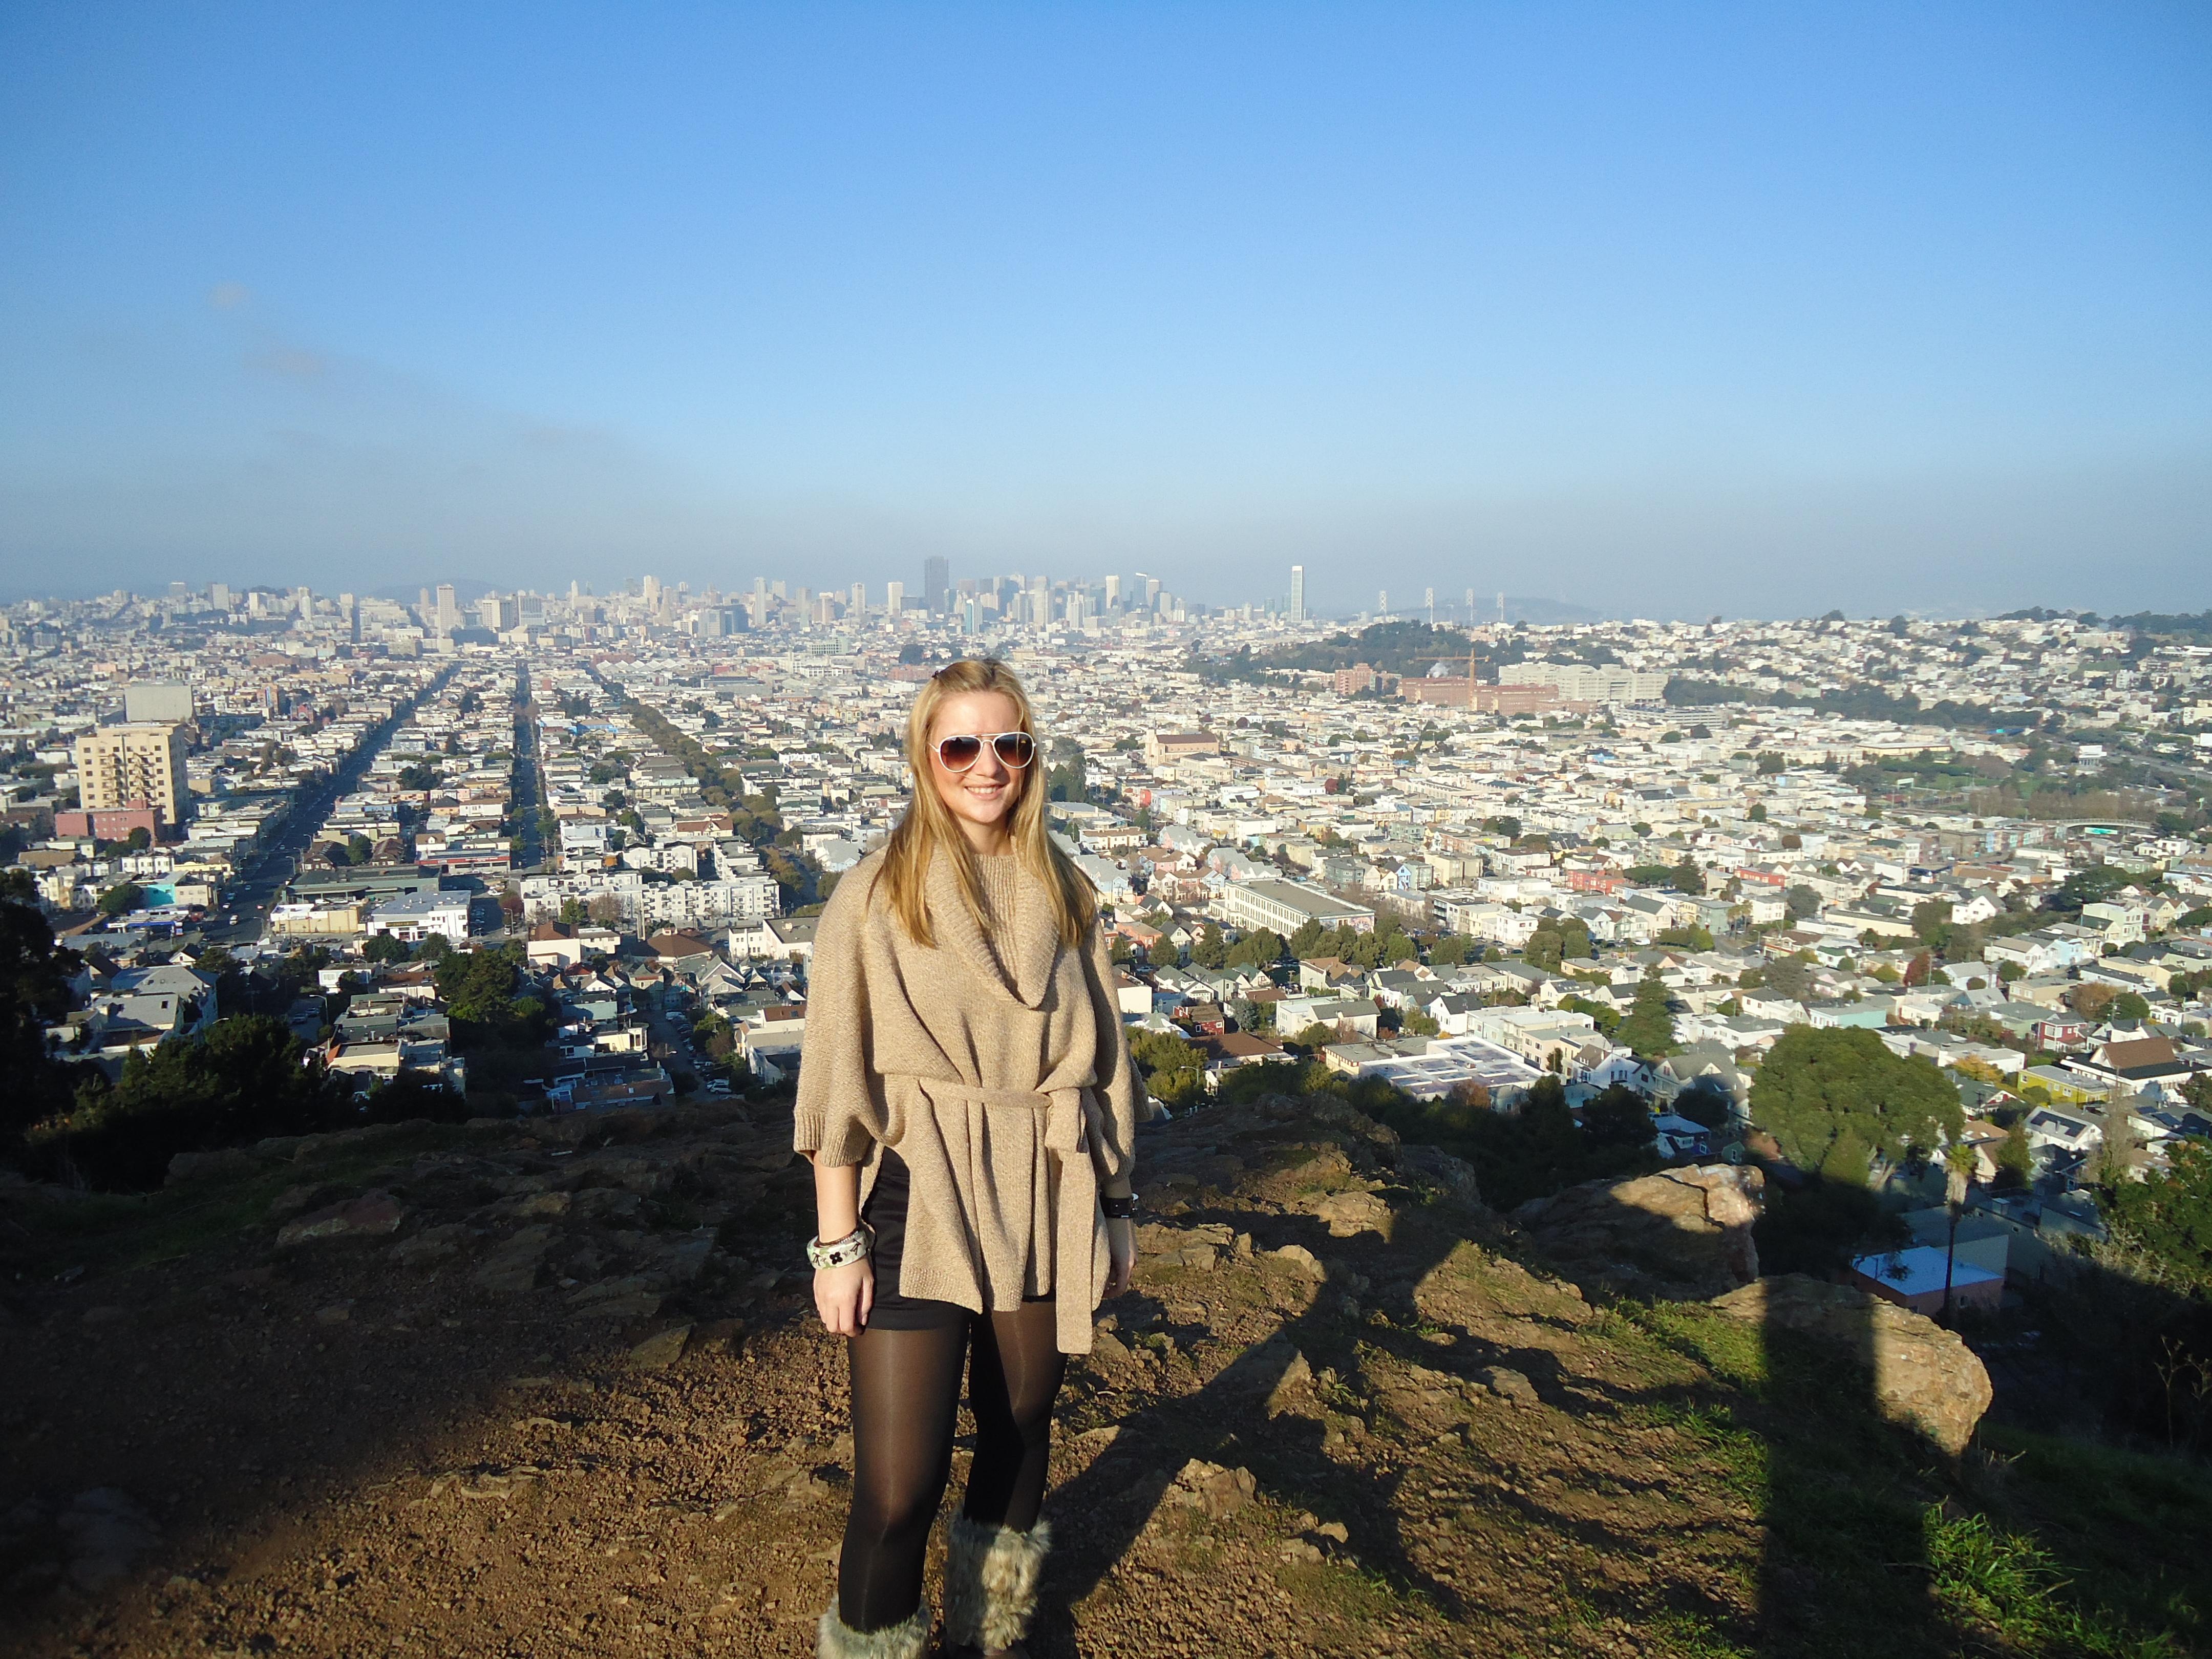 Sprachaufenthalt San Francisco | Kaplaninternational CH\'s Blog